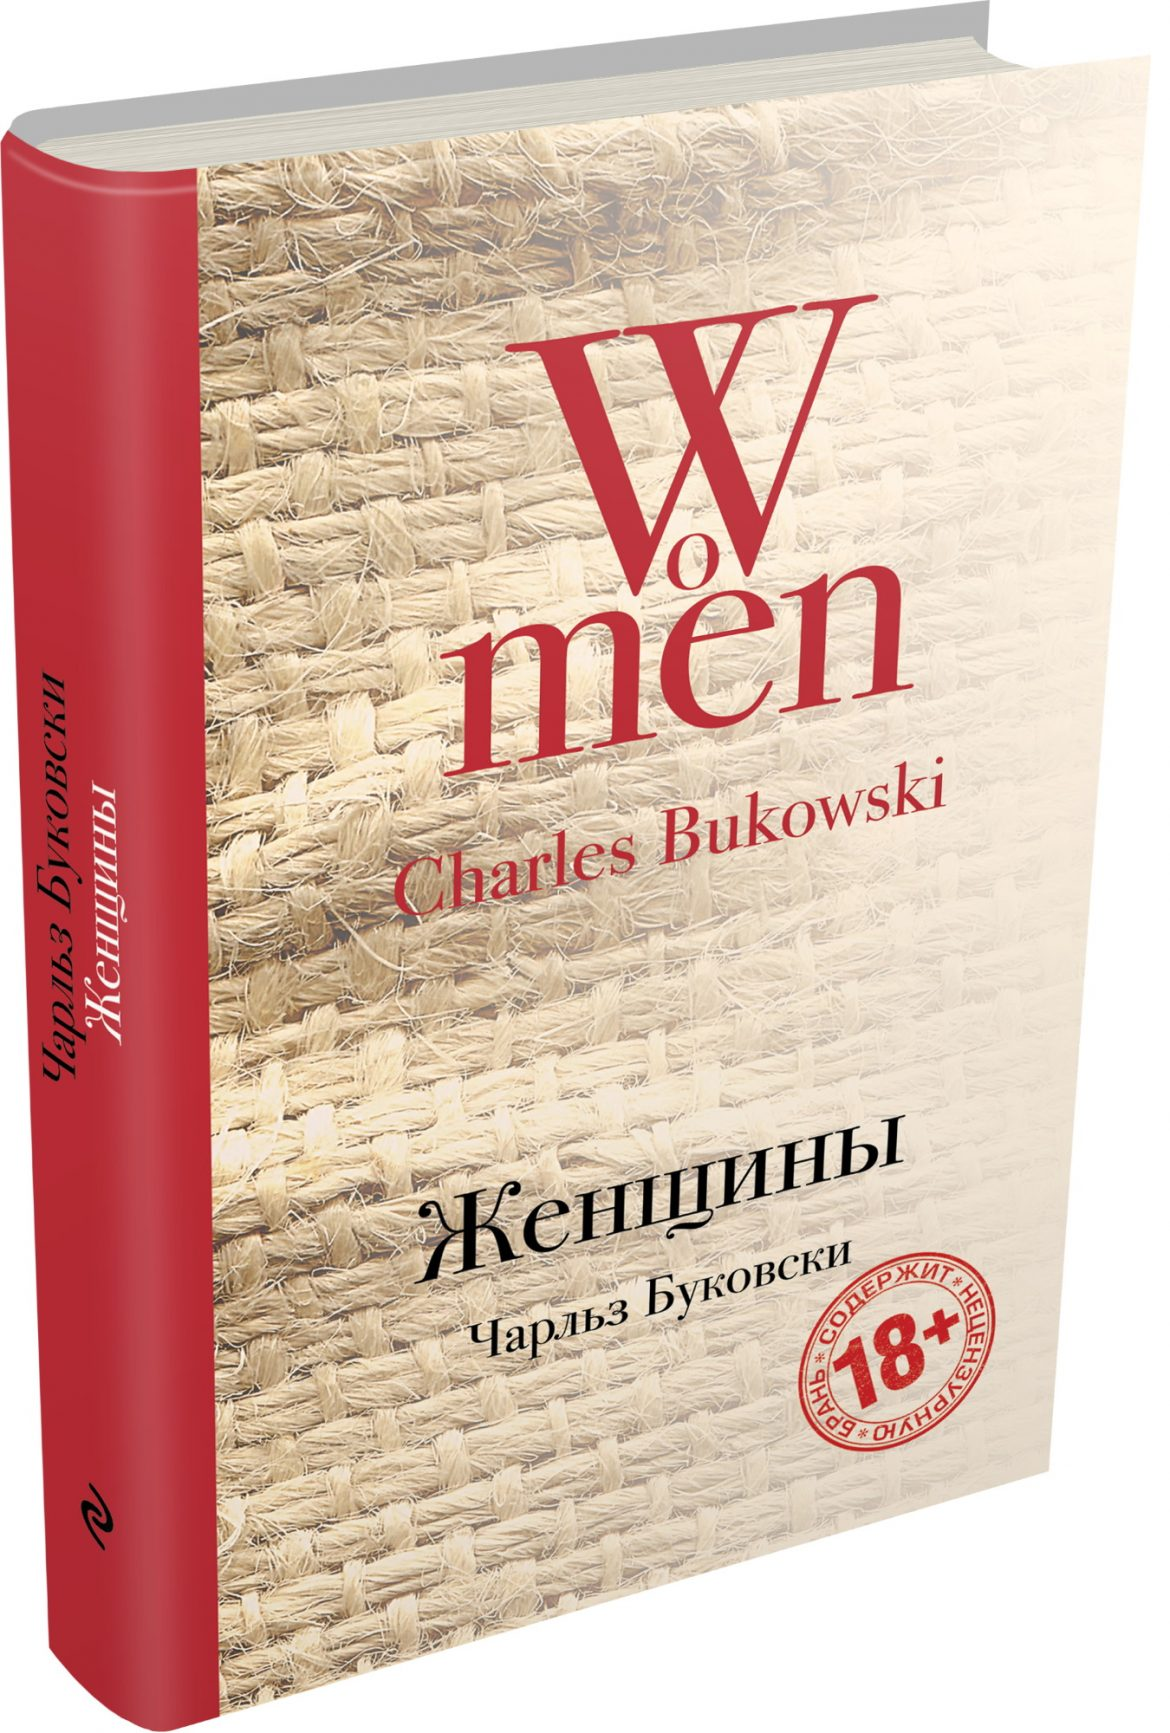 Женщины — Чарльз Буковски